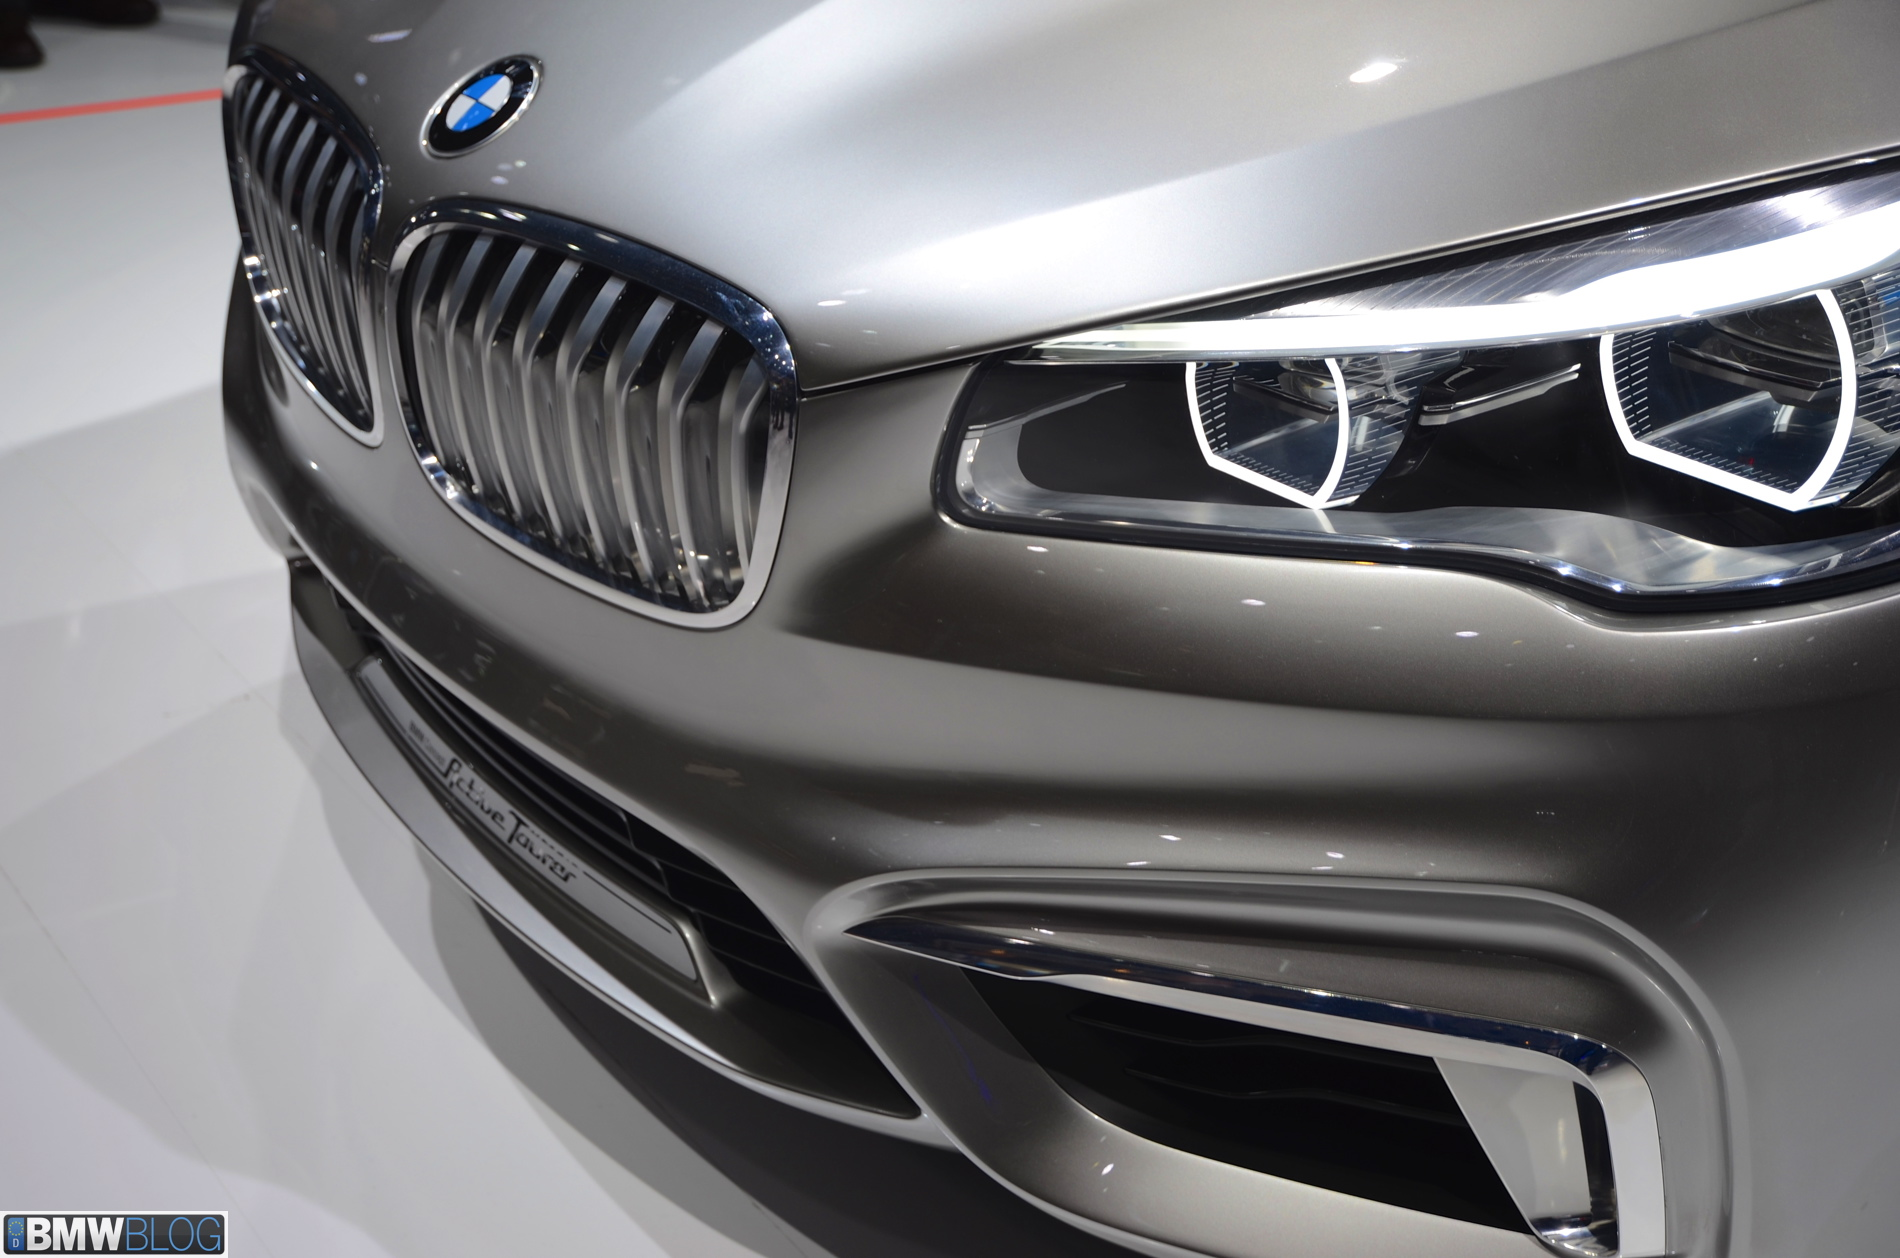 BMWBLOG Interviews Michael de Bono, Designer of BMW Concept Active ...